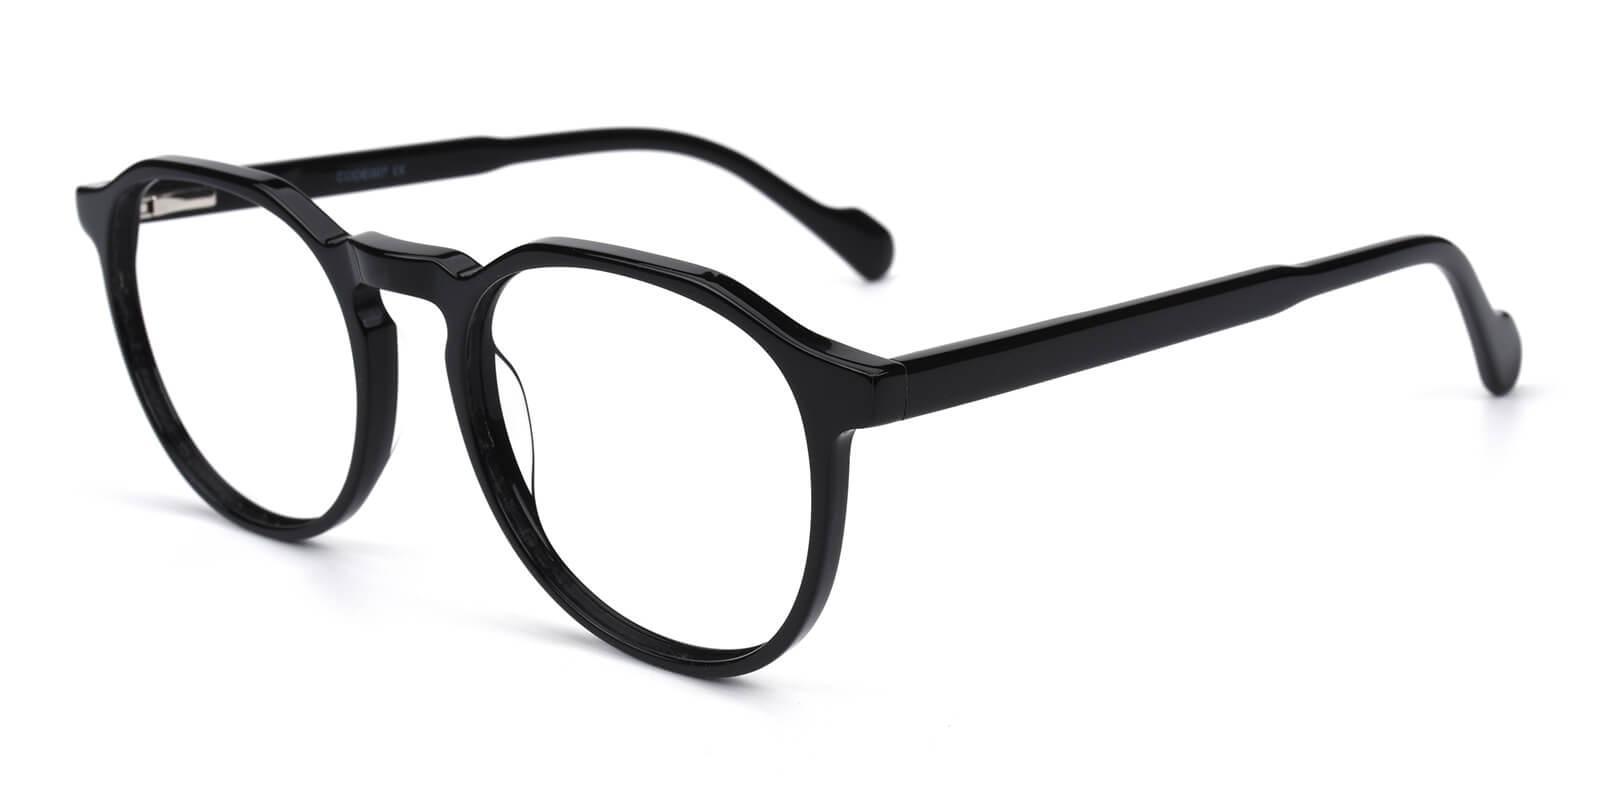 Merimis-Black-Round-TR-Eyeglasses-additional1